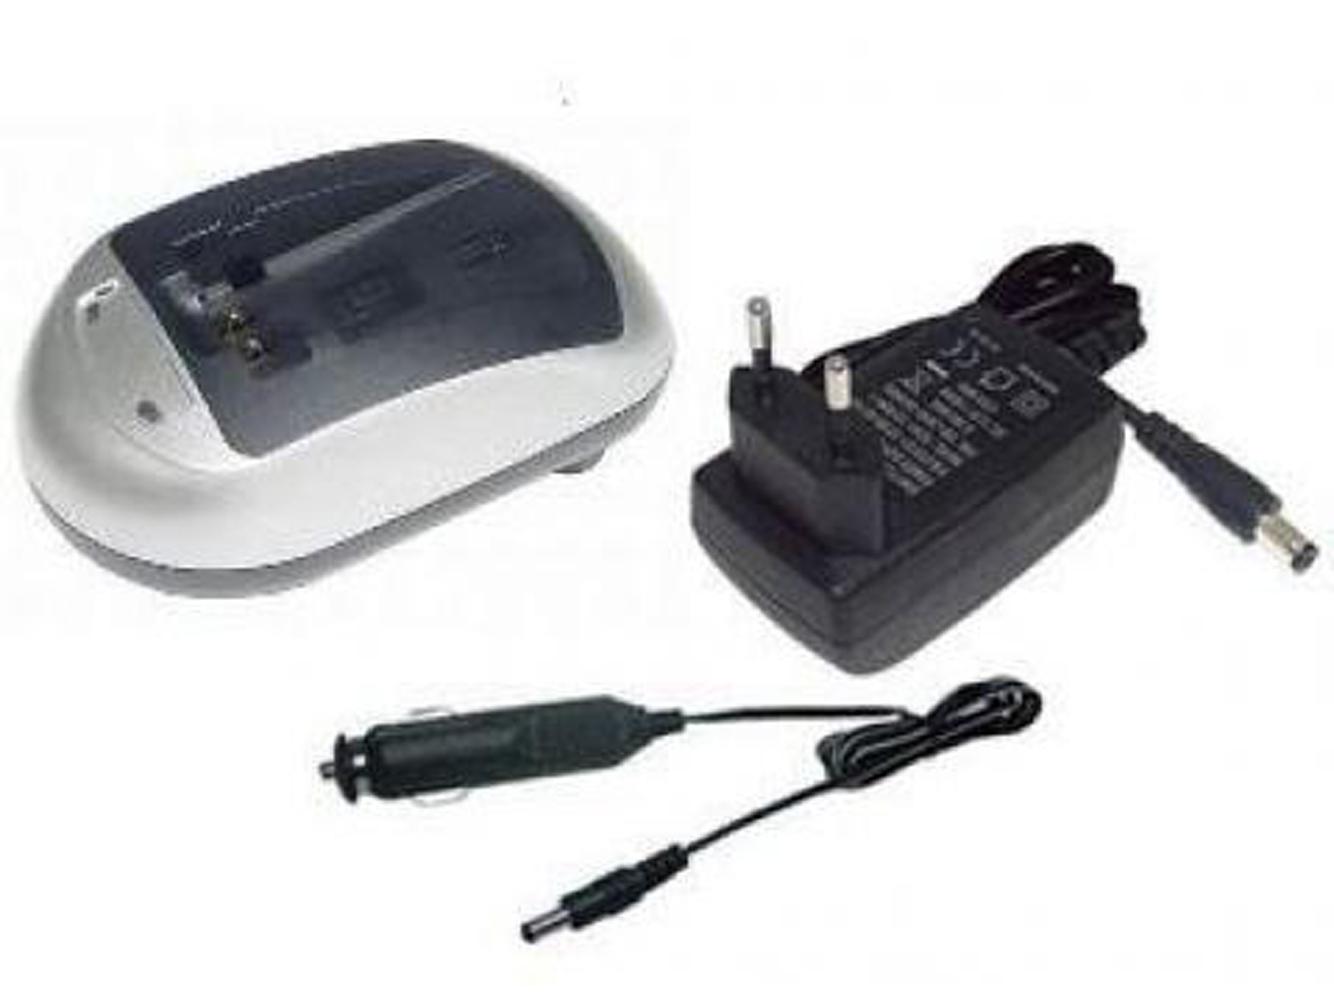 Battery Charger for SANYO DB-L10, DB-L10B, VAR-L10